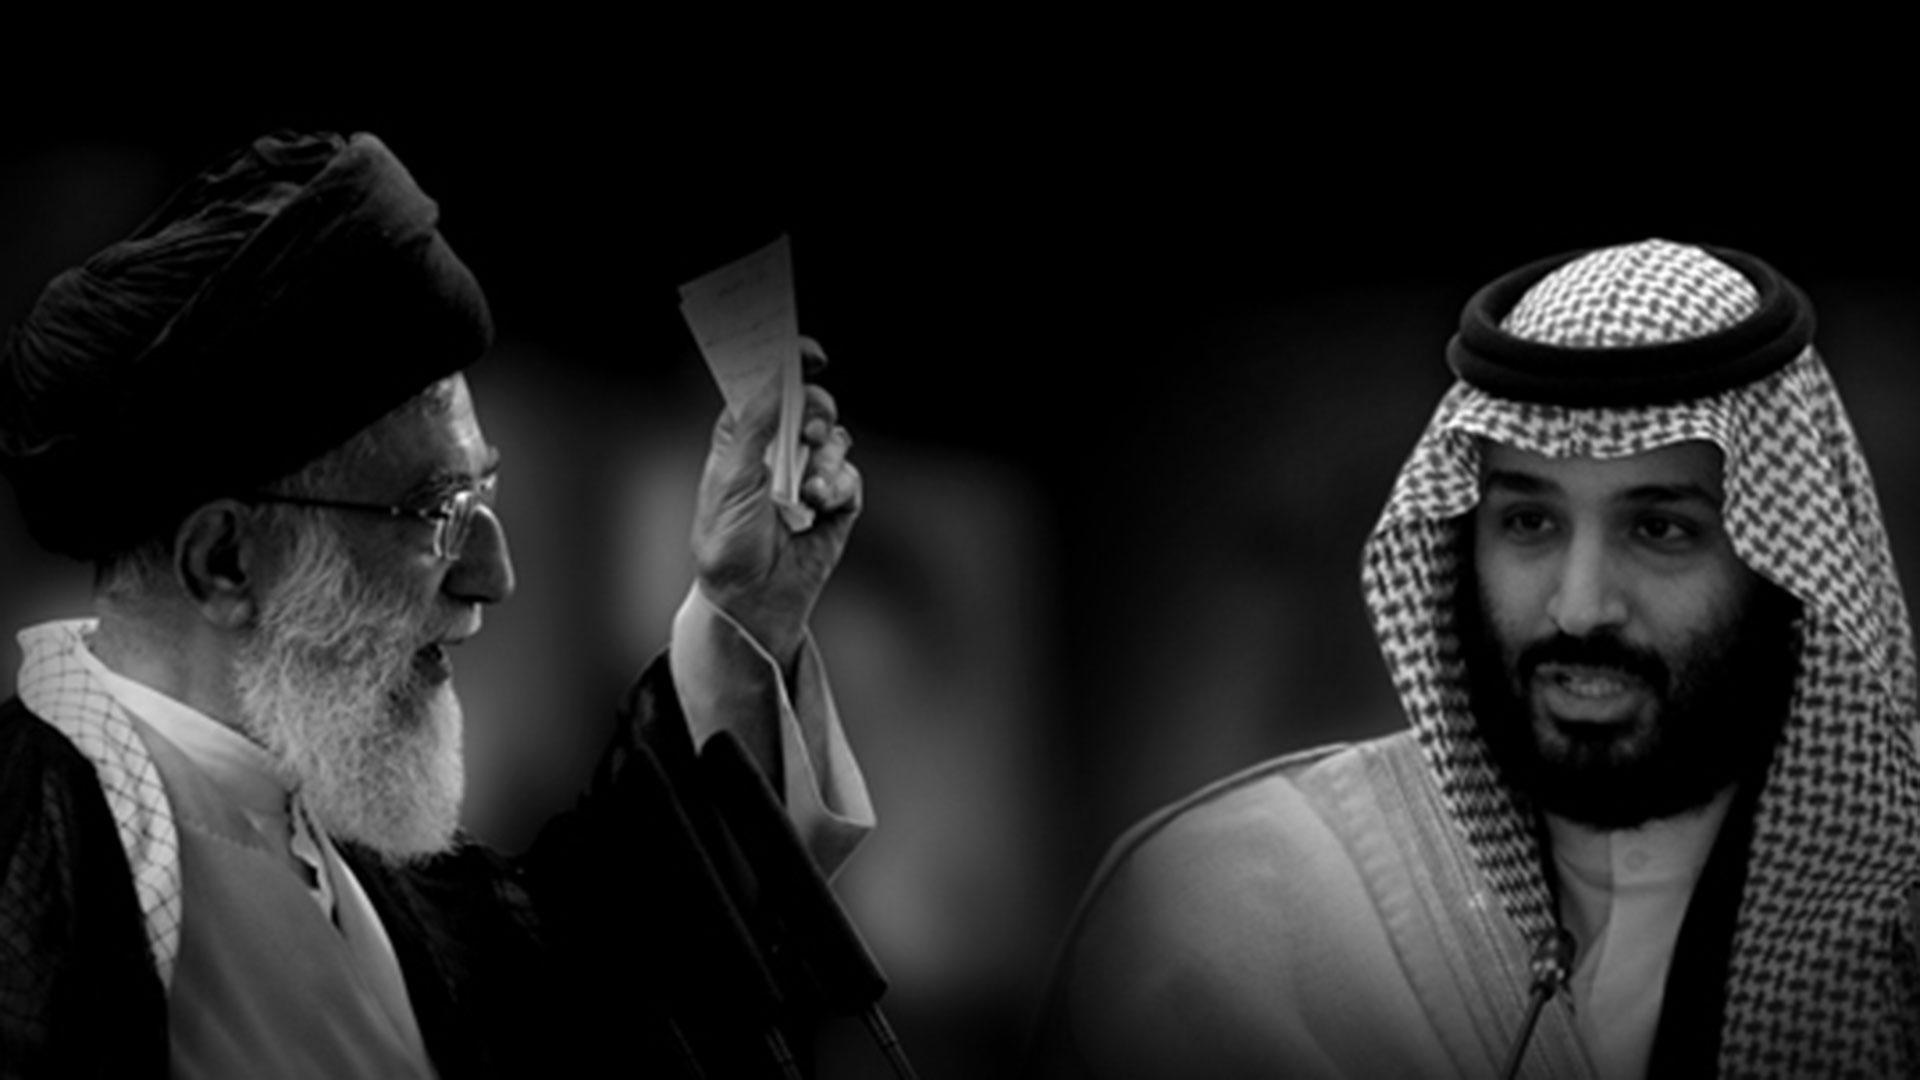 Pictured (l-r): Iran's Supreme Leader Ayatollah Ali Khamenei and Saudi Crown Prince Mohammed bin Salman.